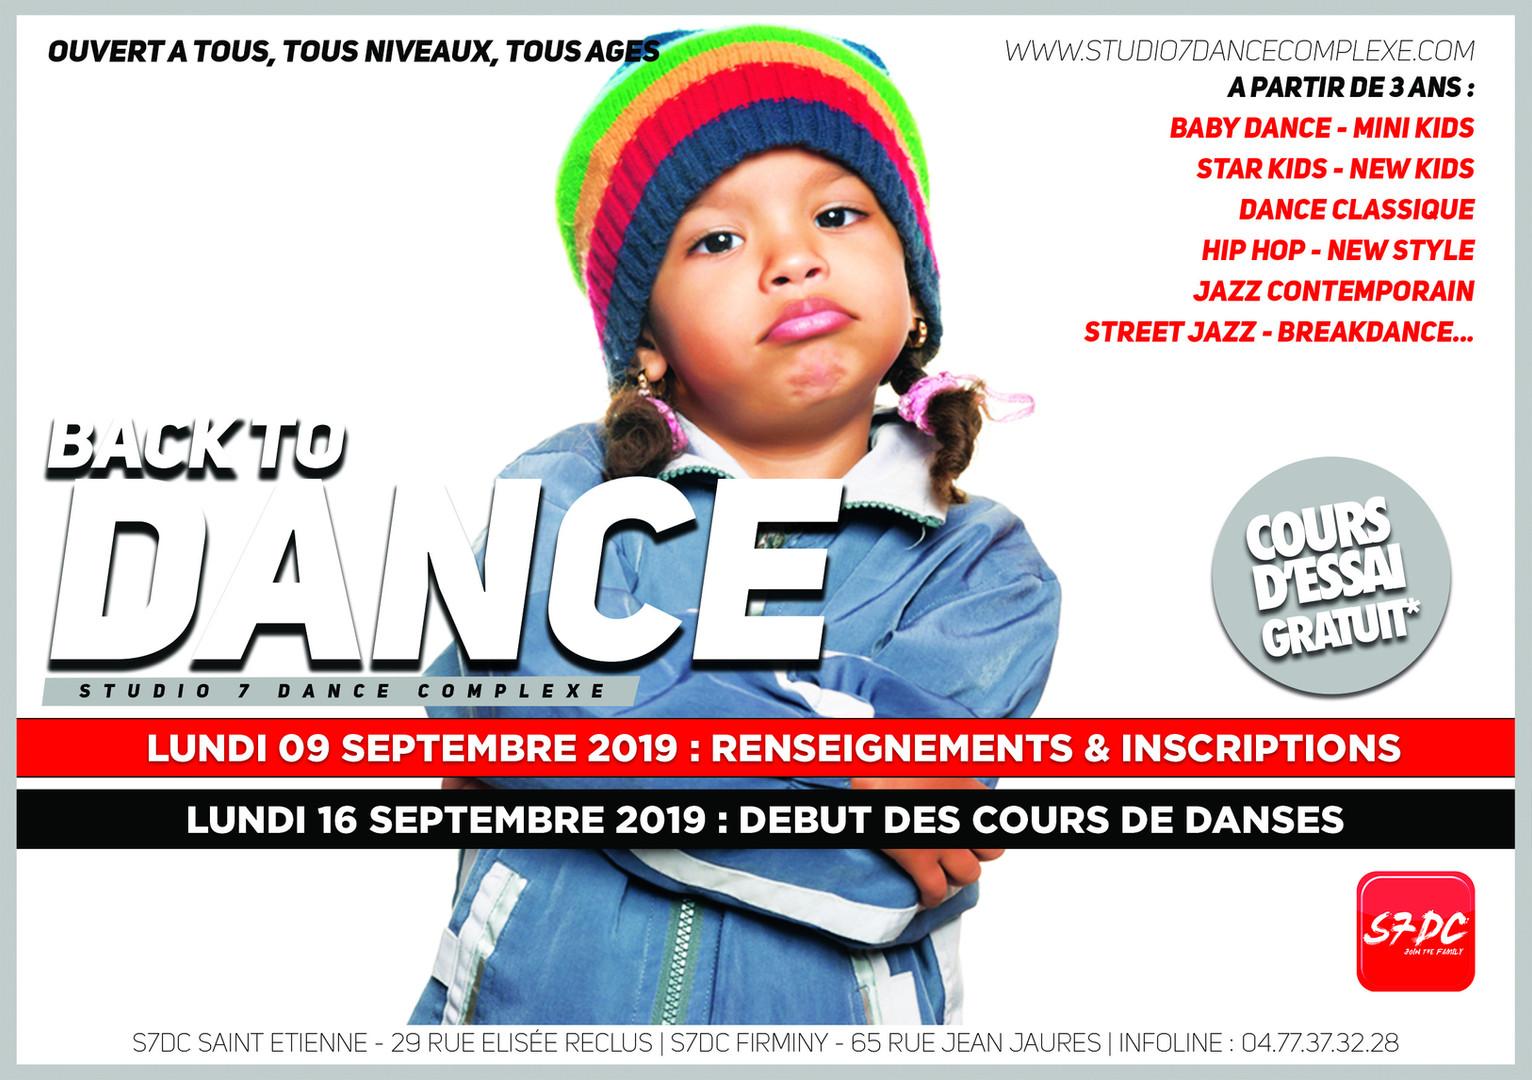 BACK TO DANCE 4 - KIDS BRAS CROISES.jpg